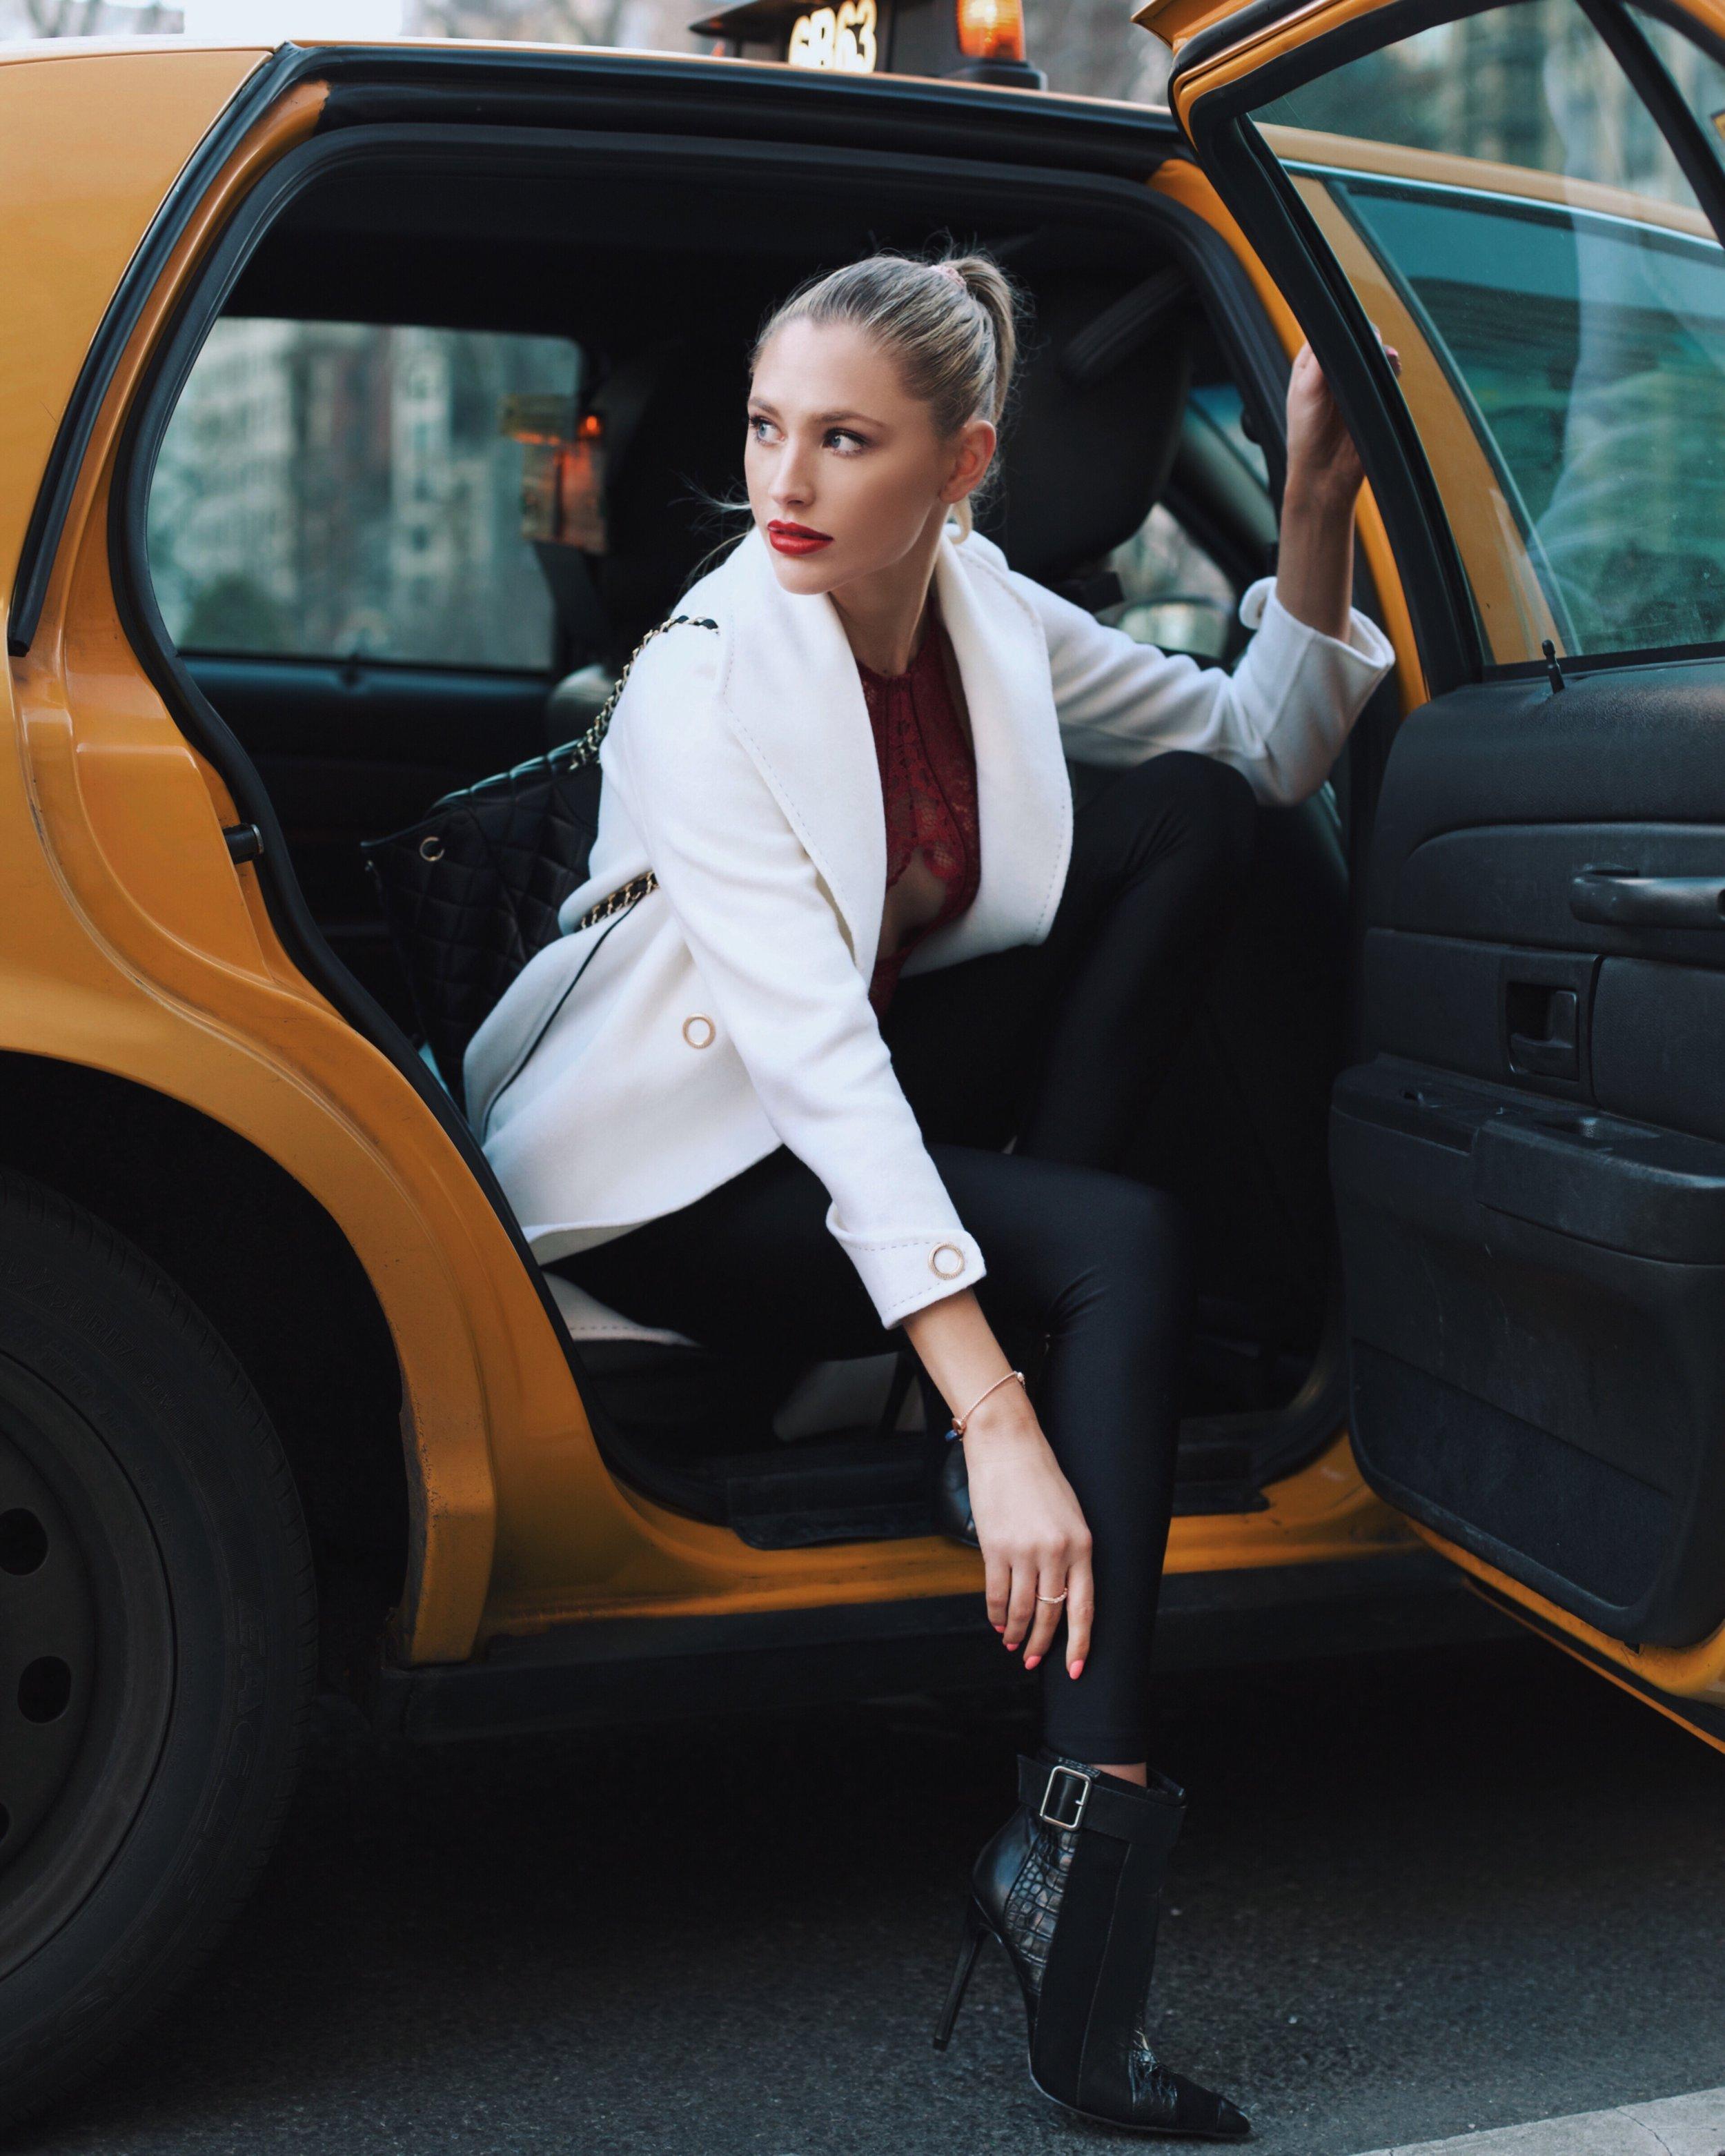 Taxi Shoedazzle.jpg